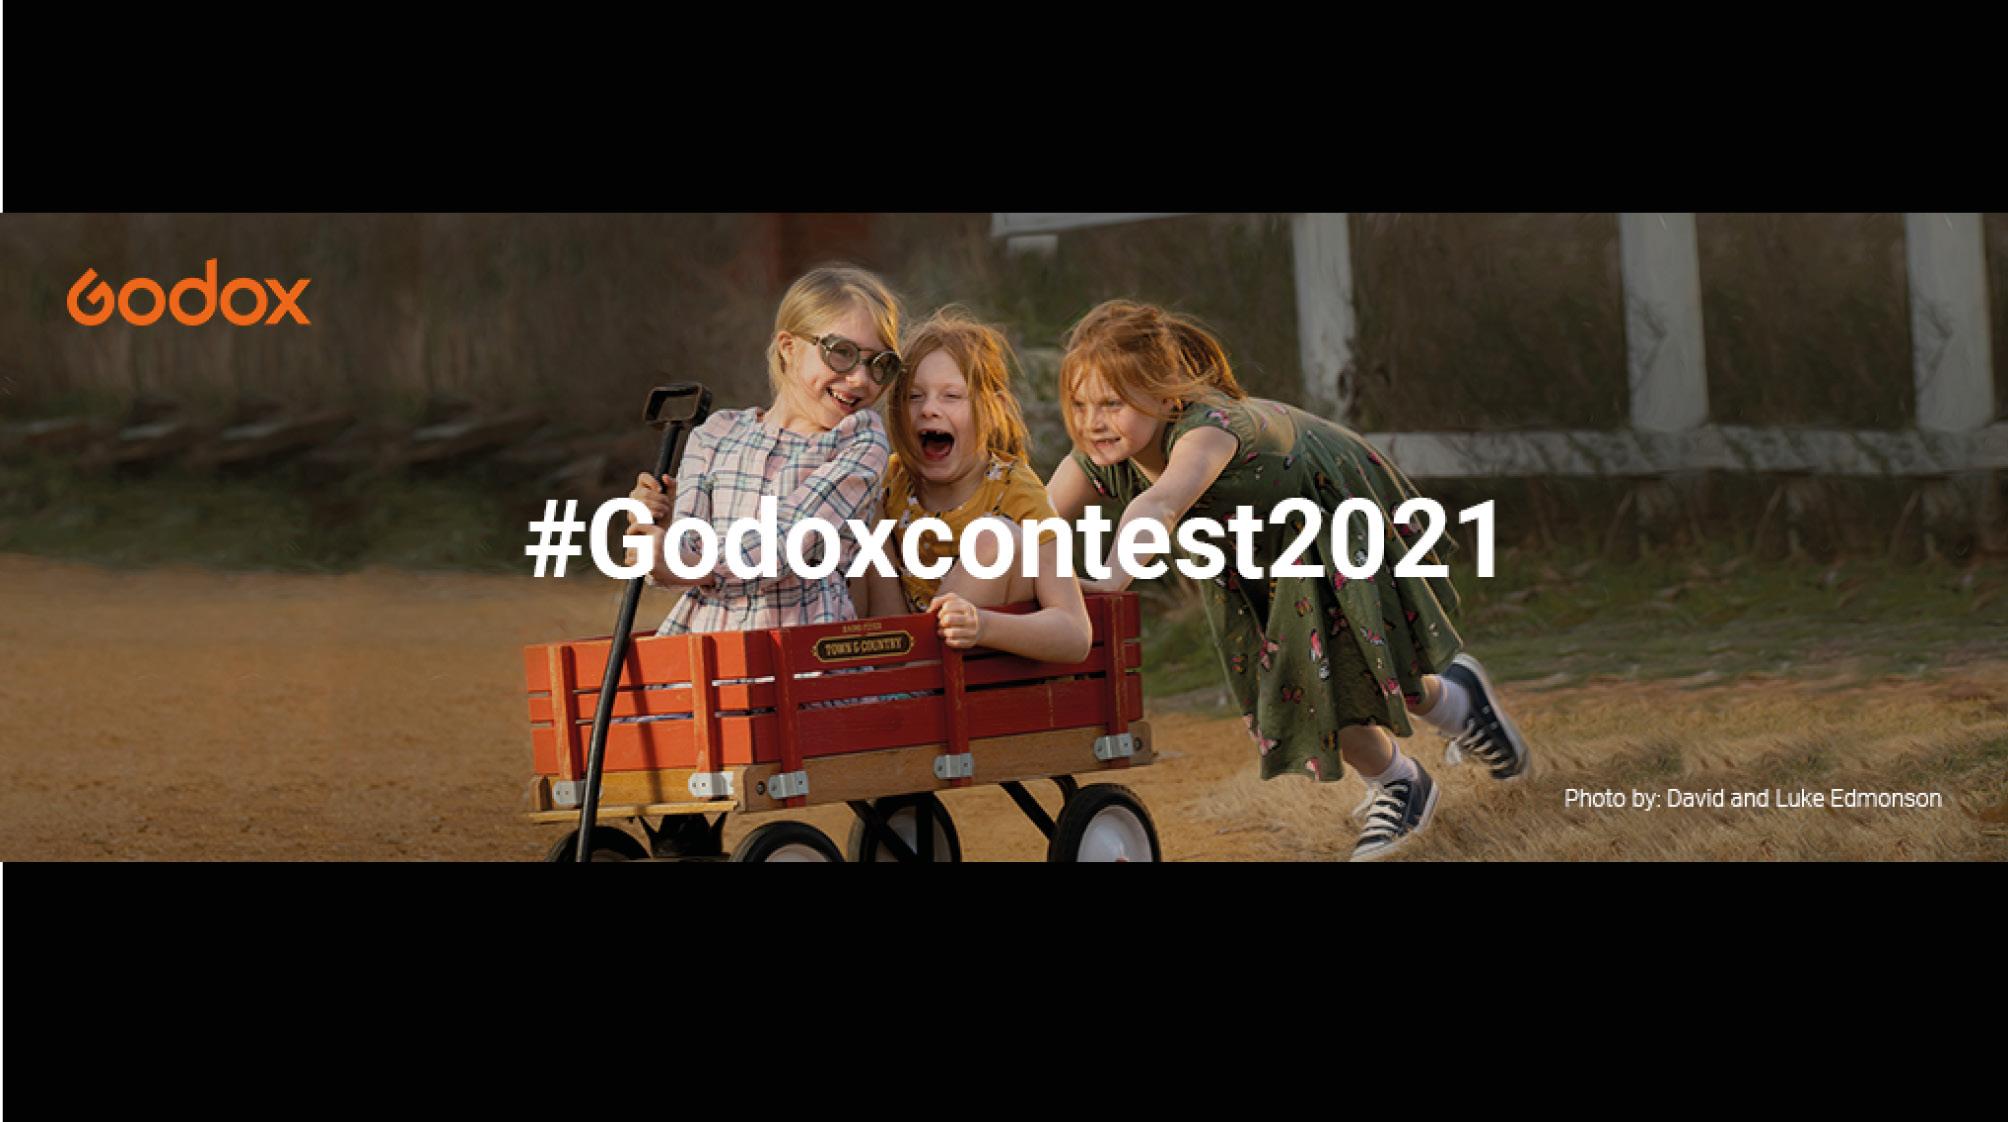 godox_contest_slider